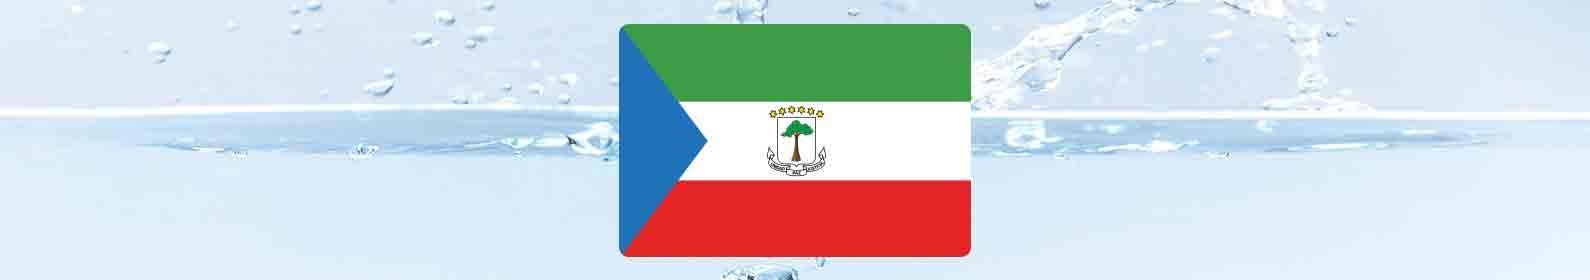 water-treatment-equatorial-guinea.jpg